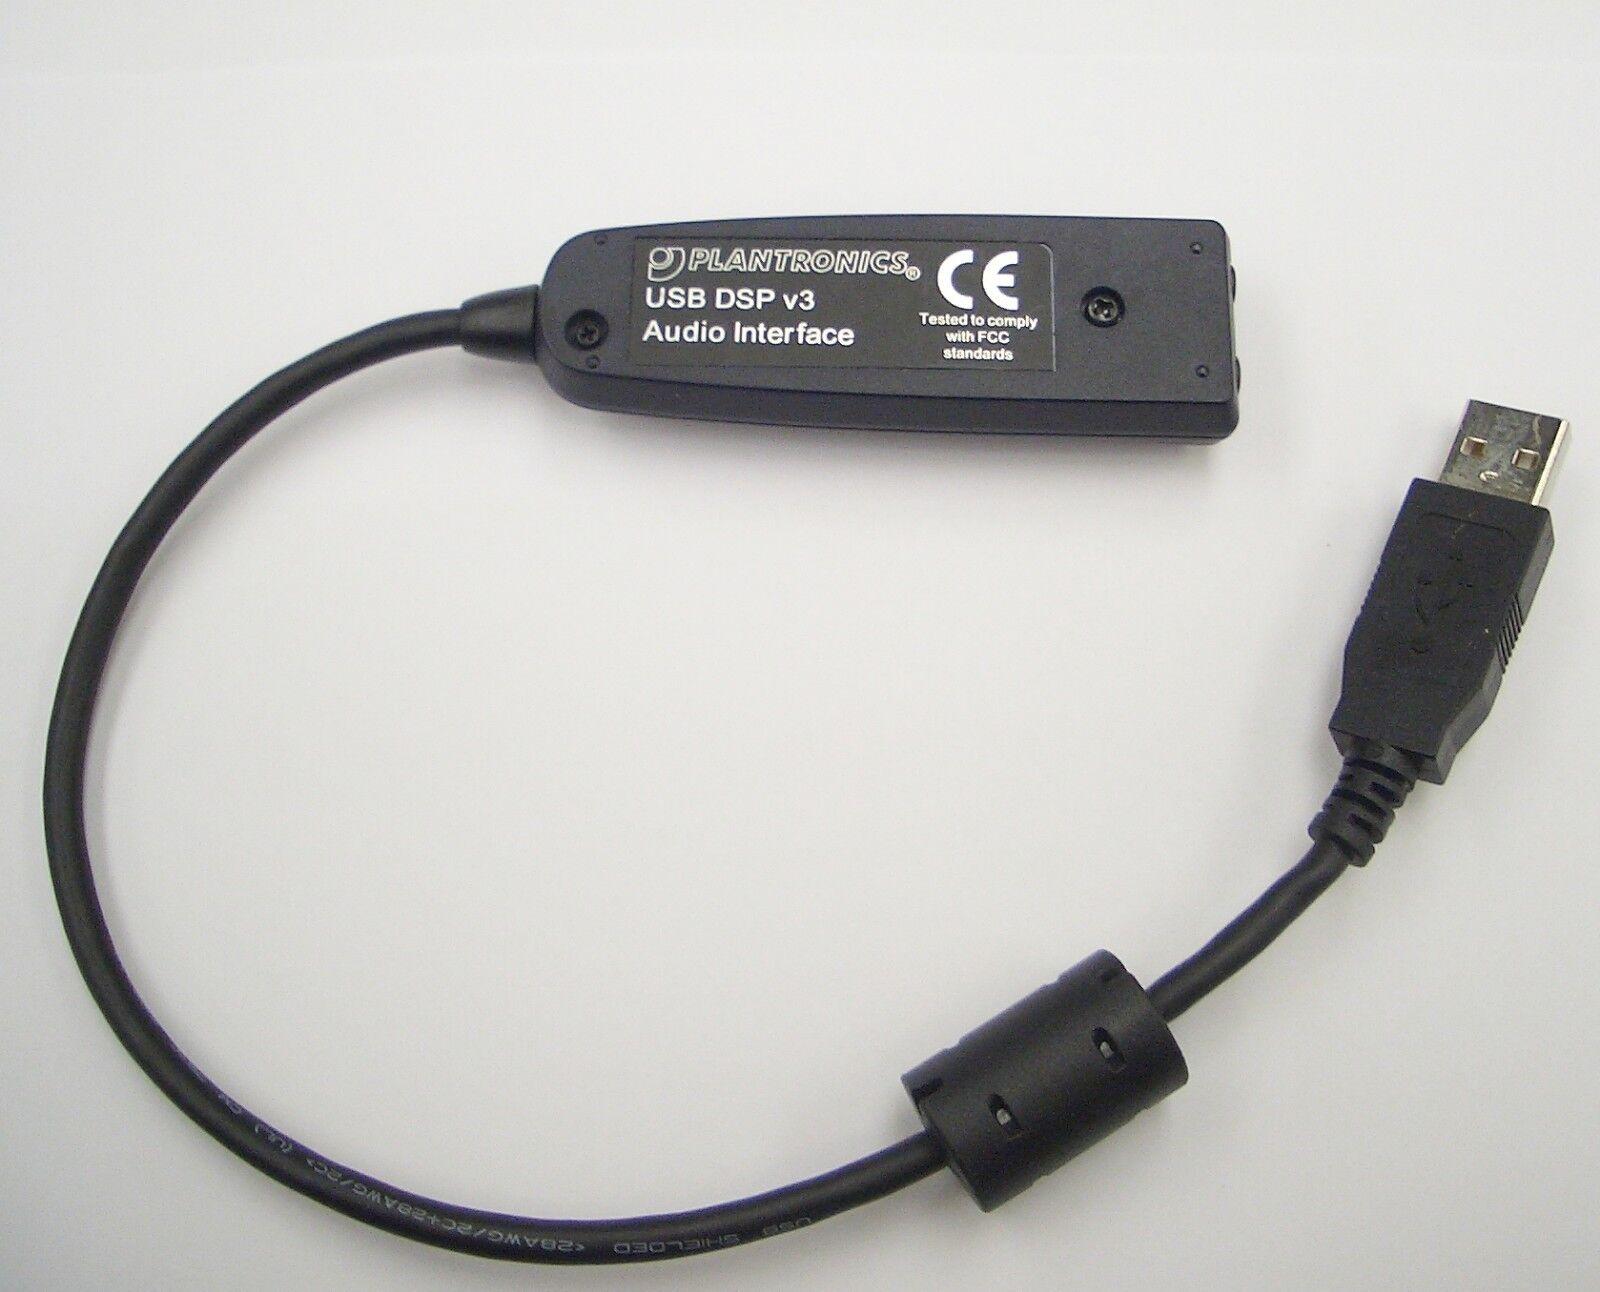 PLANTRONICS USB DSP DRIVER FREE